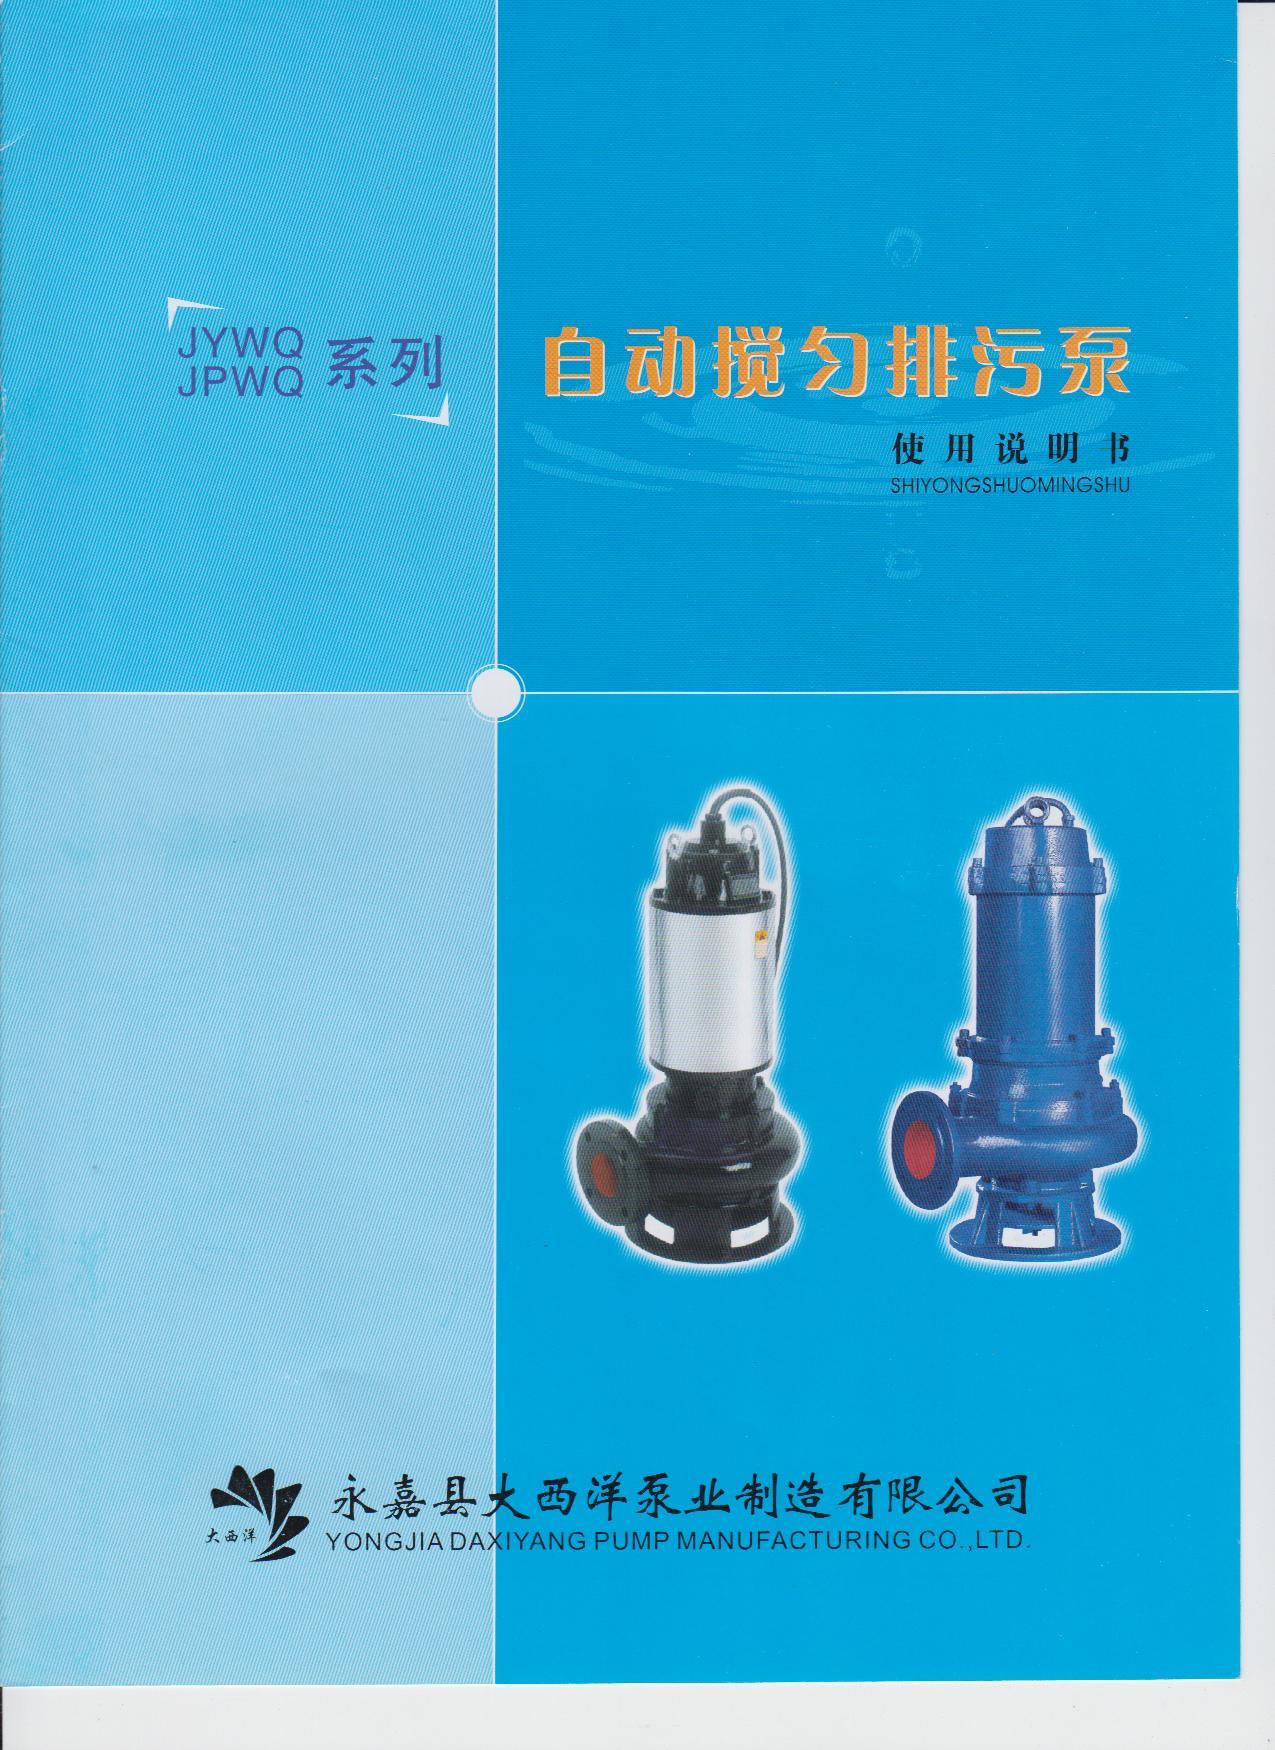 (JYWQ,JPWQ)自动搅匀排污泵样本图